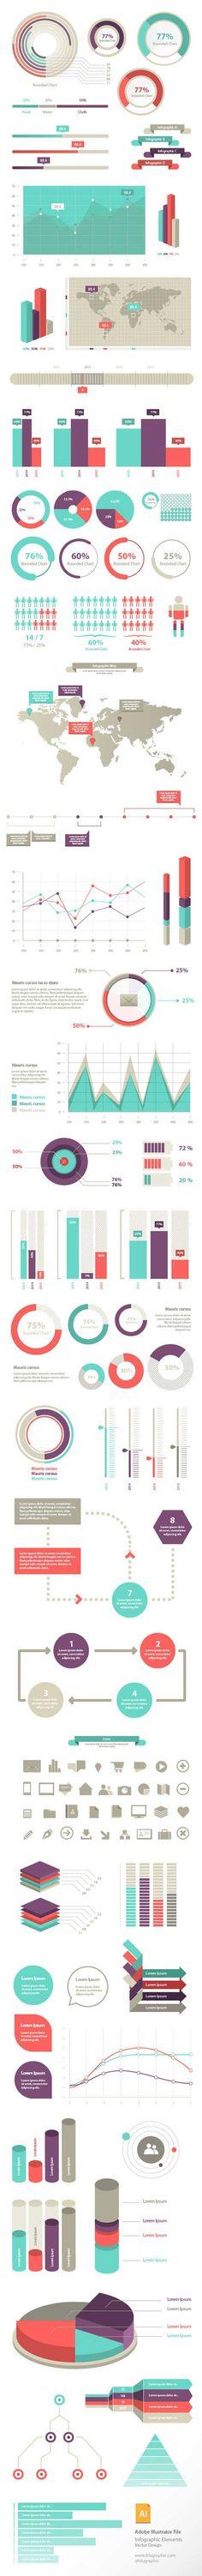 20 Free Infographic Vector Element Kits - Designbeep | Design Inspiration Free Resources